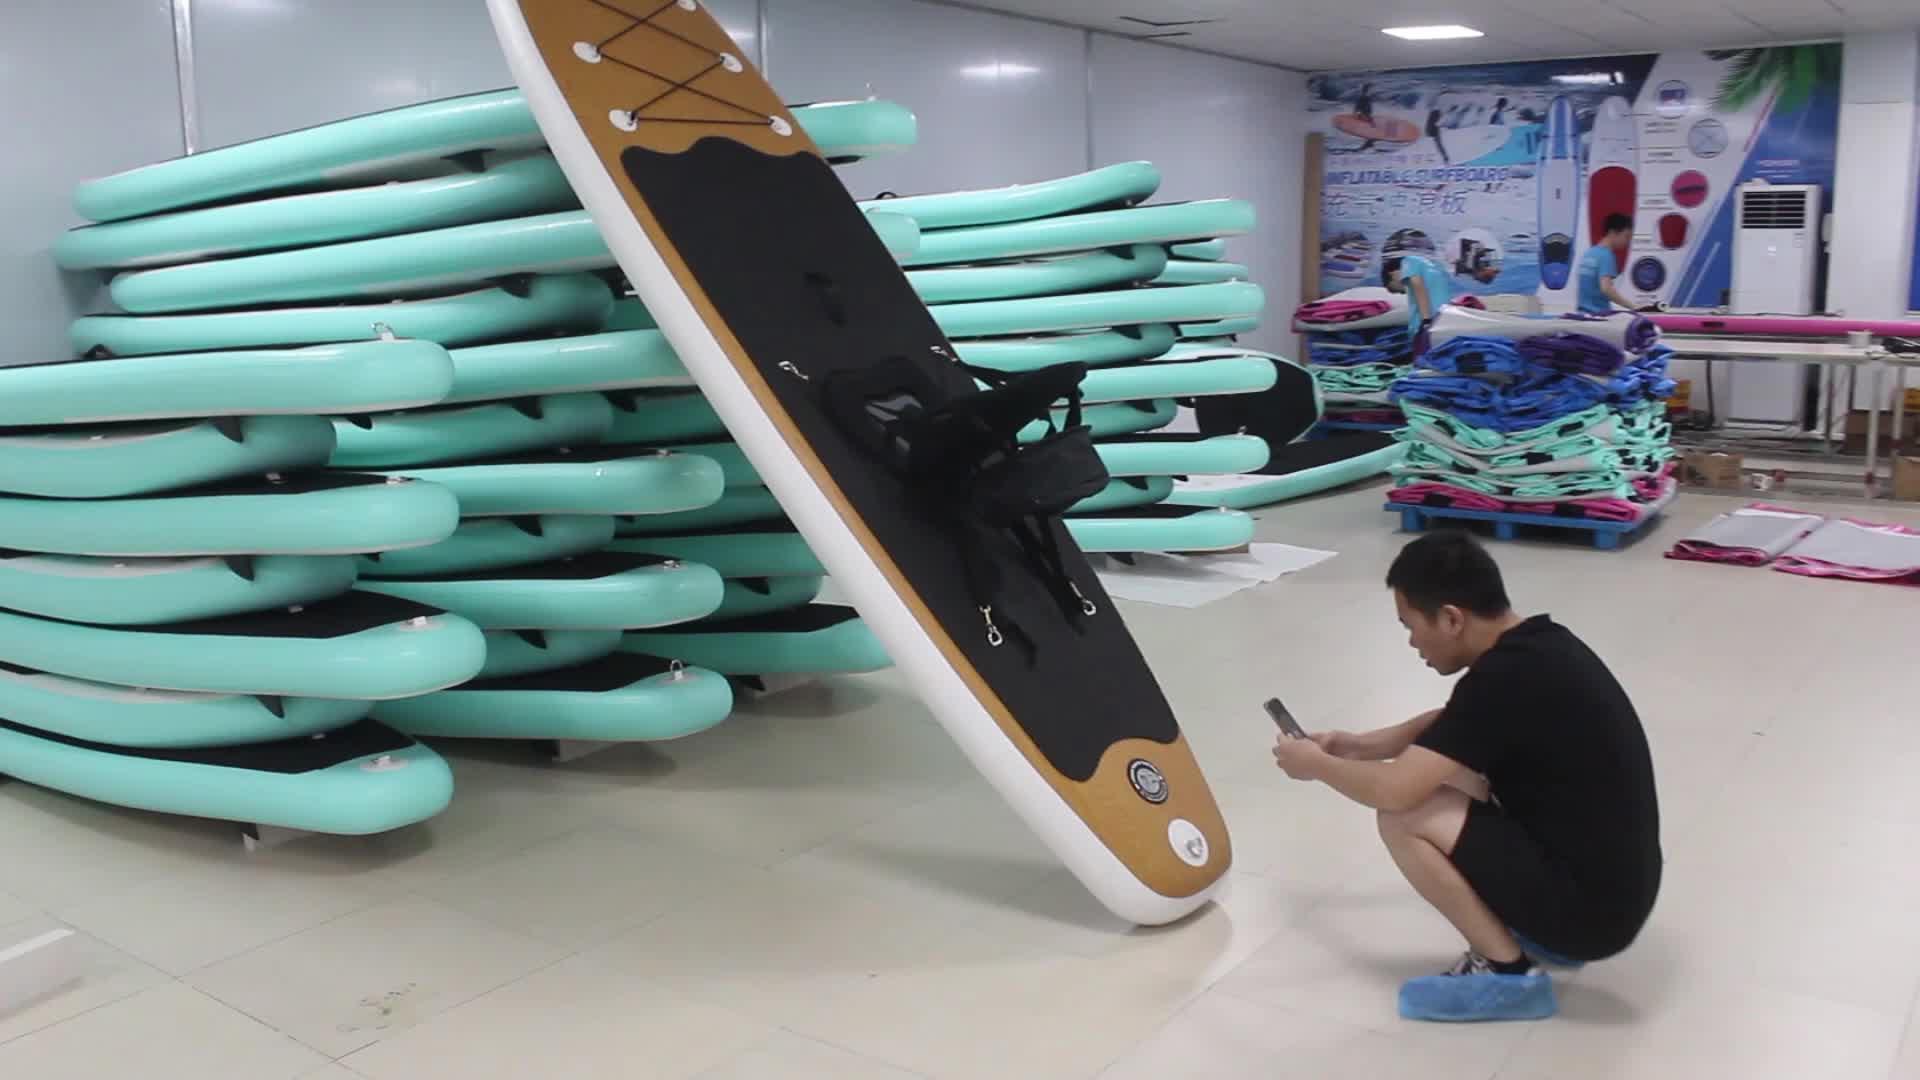 Lichtgewicht zachte stand up custom opvouwbare sup boards opblaasbare paddle